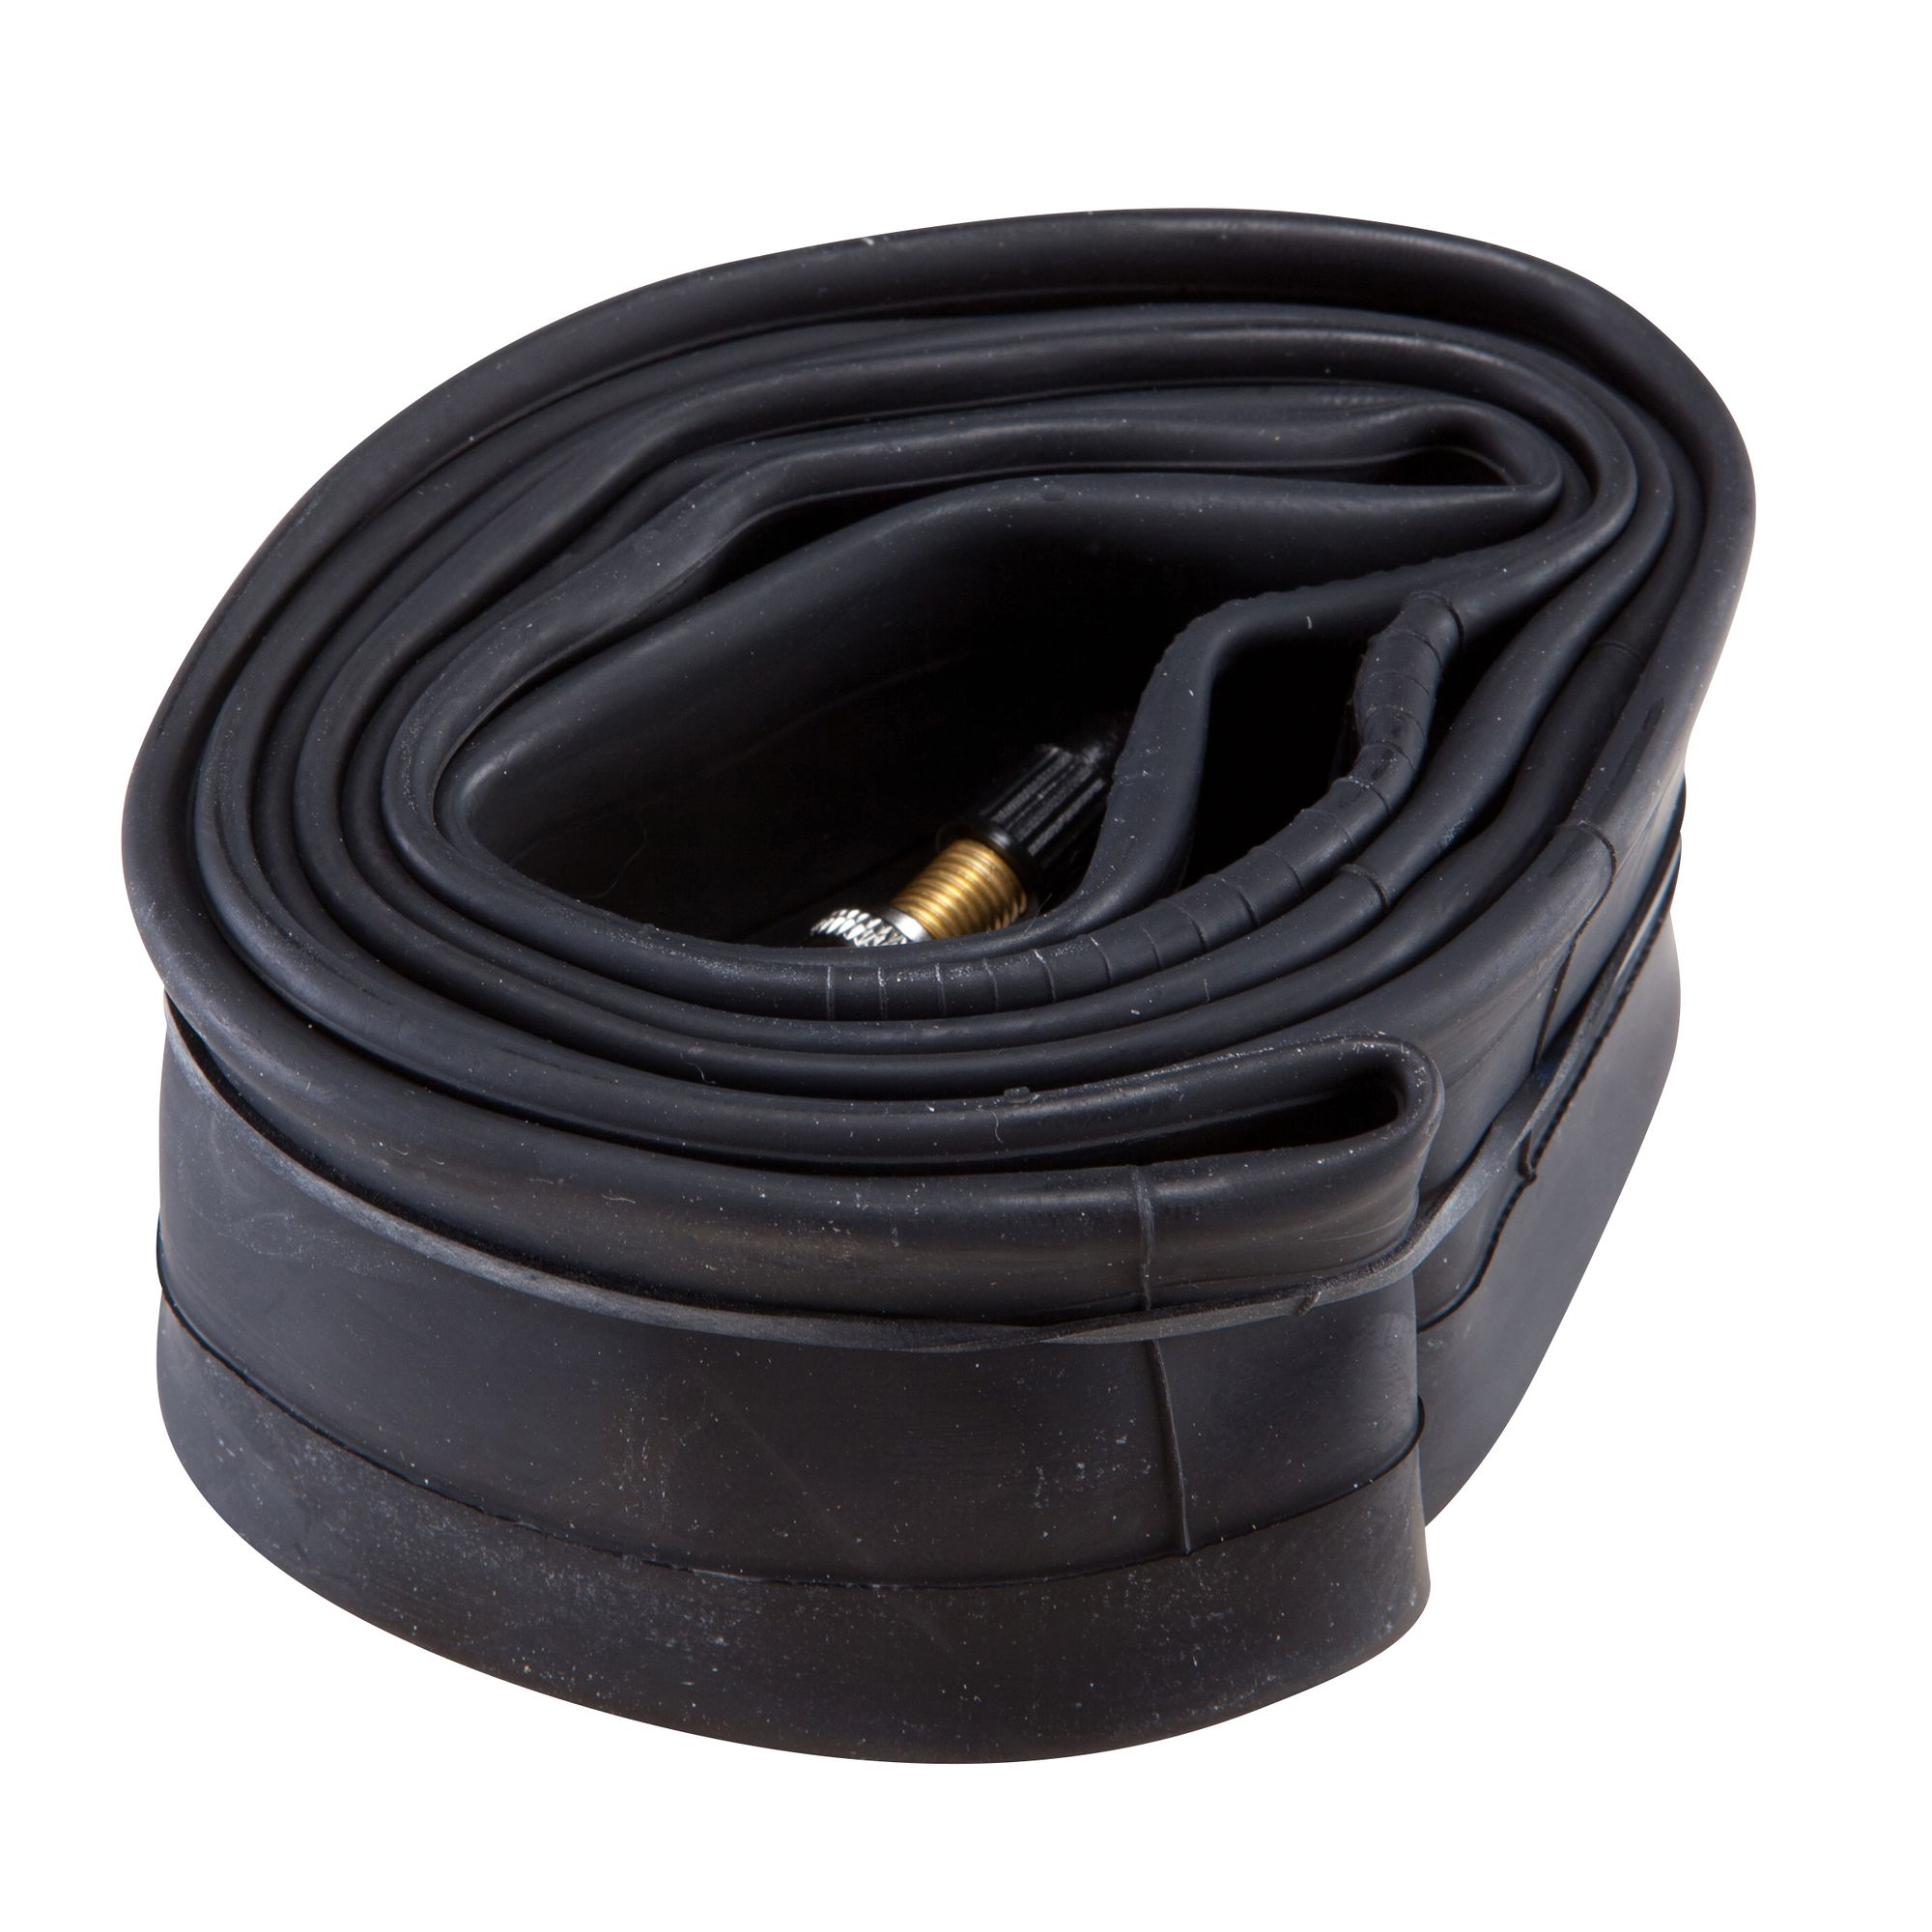 Chambre a air 16 pouces section 1 7 2 2 valve presta for Chambre a air 13 5 6